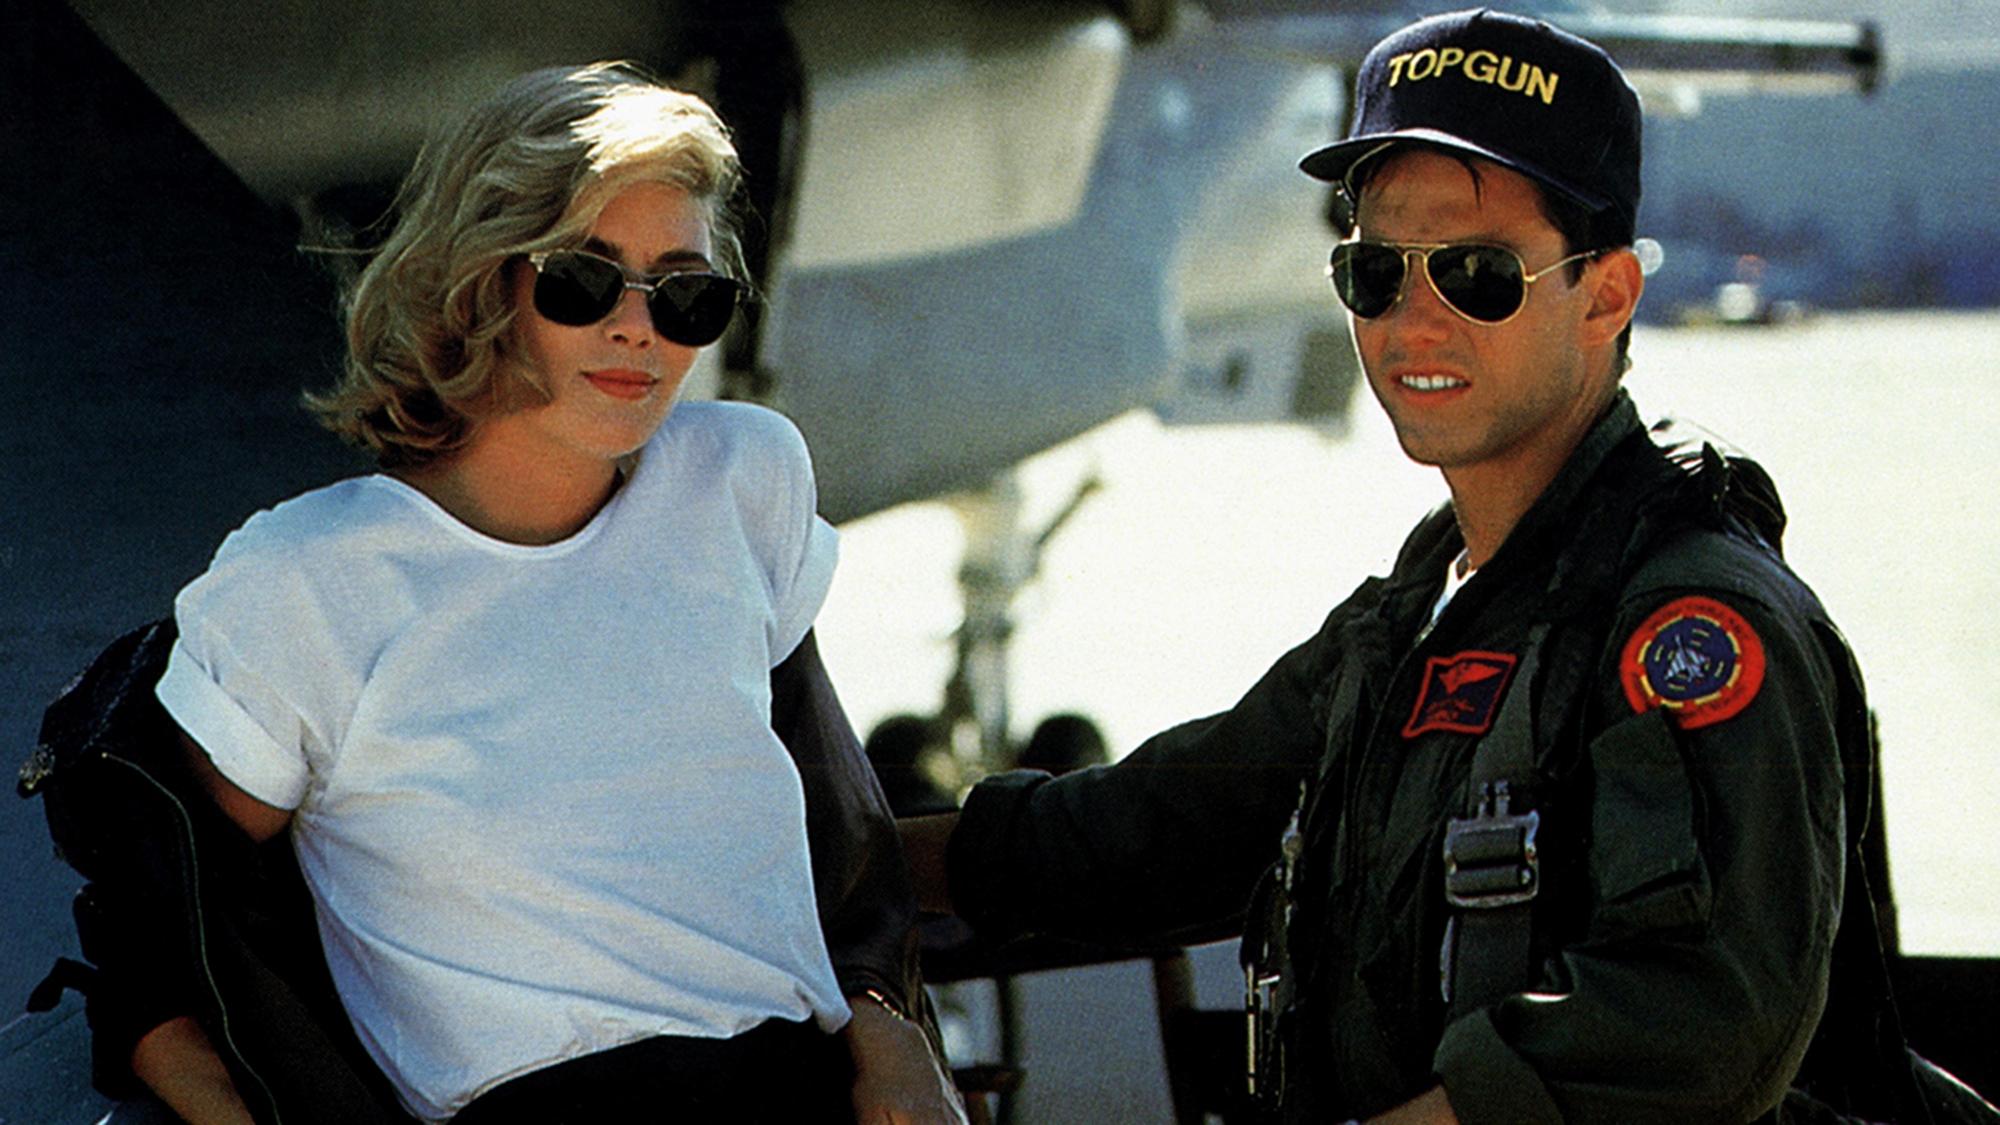 Best Ray-Ban Sunglasses: Aviator, Wayfarer, Clubmaster & More